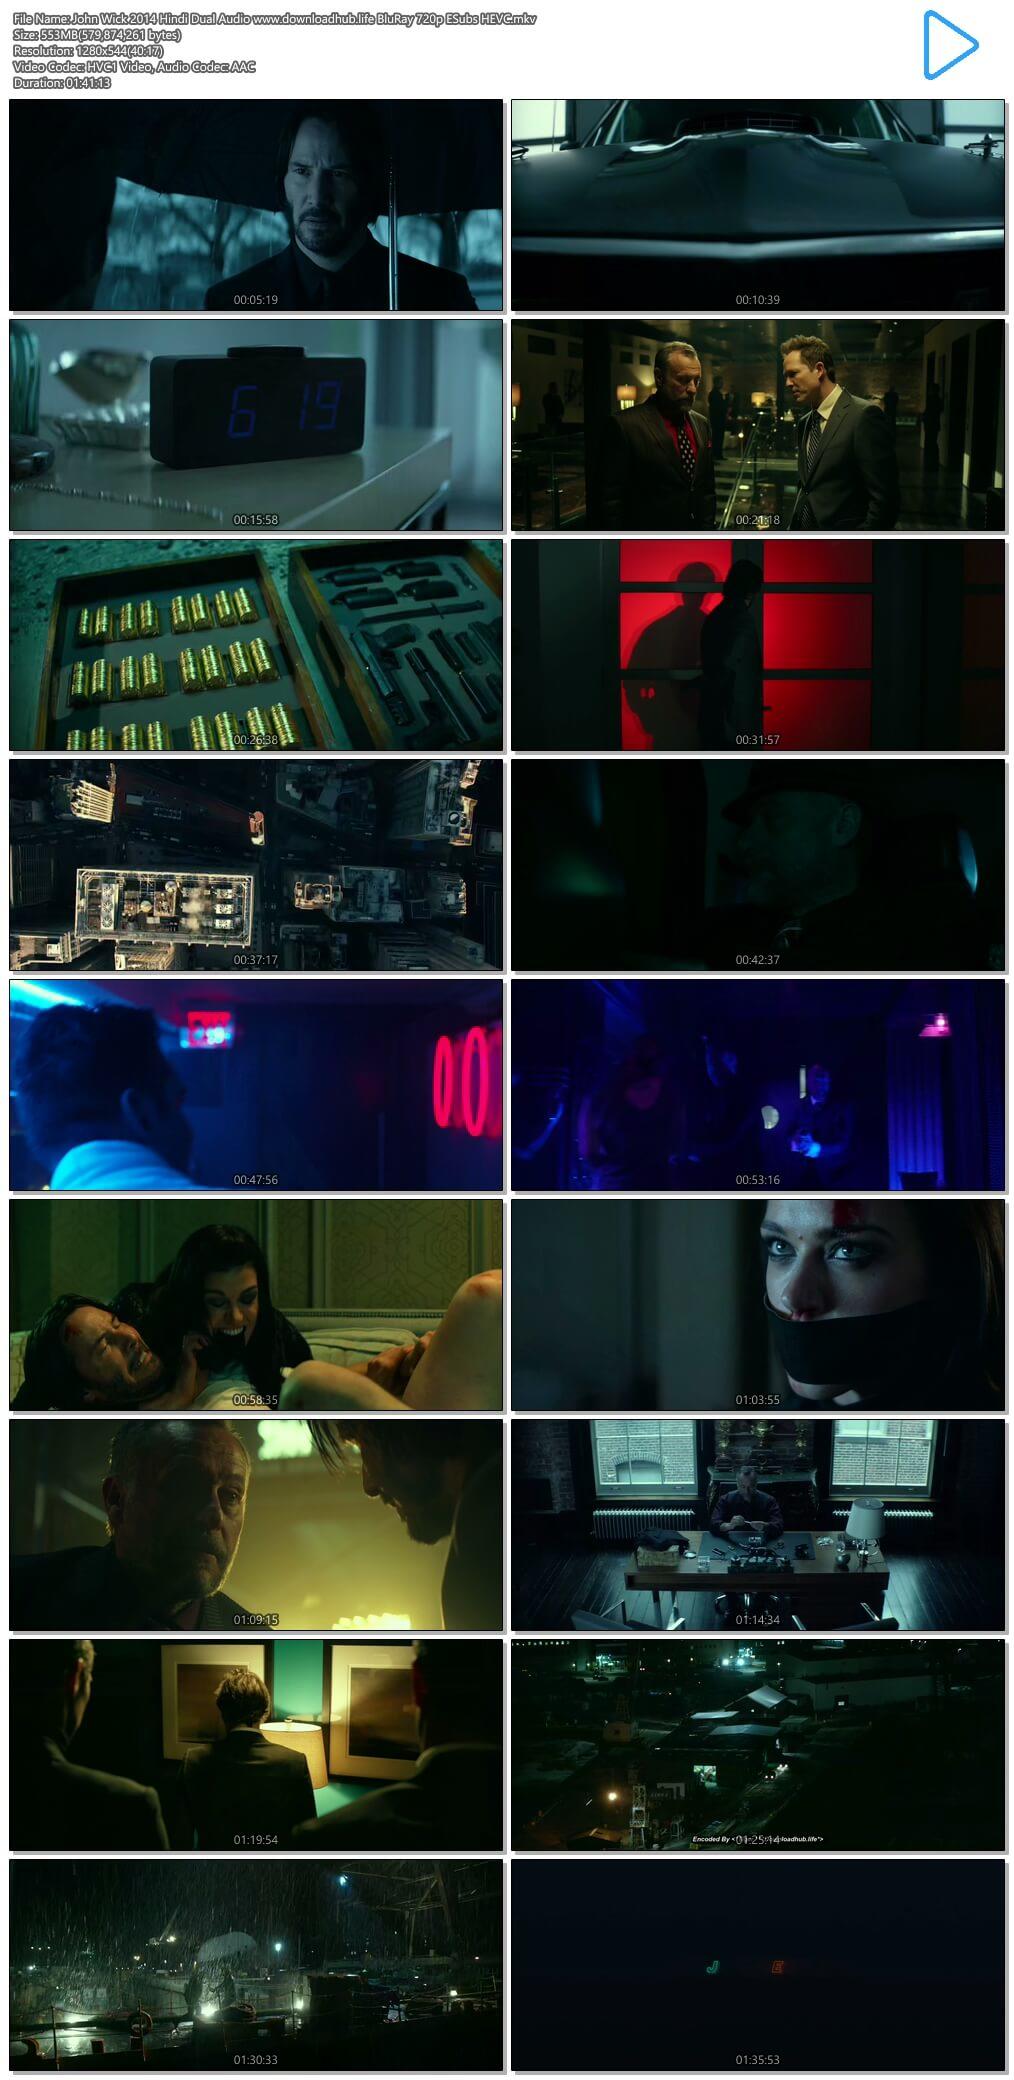 John Wick 2014 Hindi Dual Audio 550MB BluRay 720p ESubs HEVC